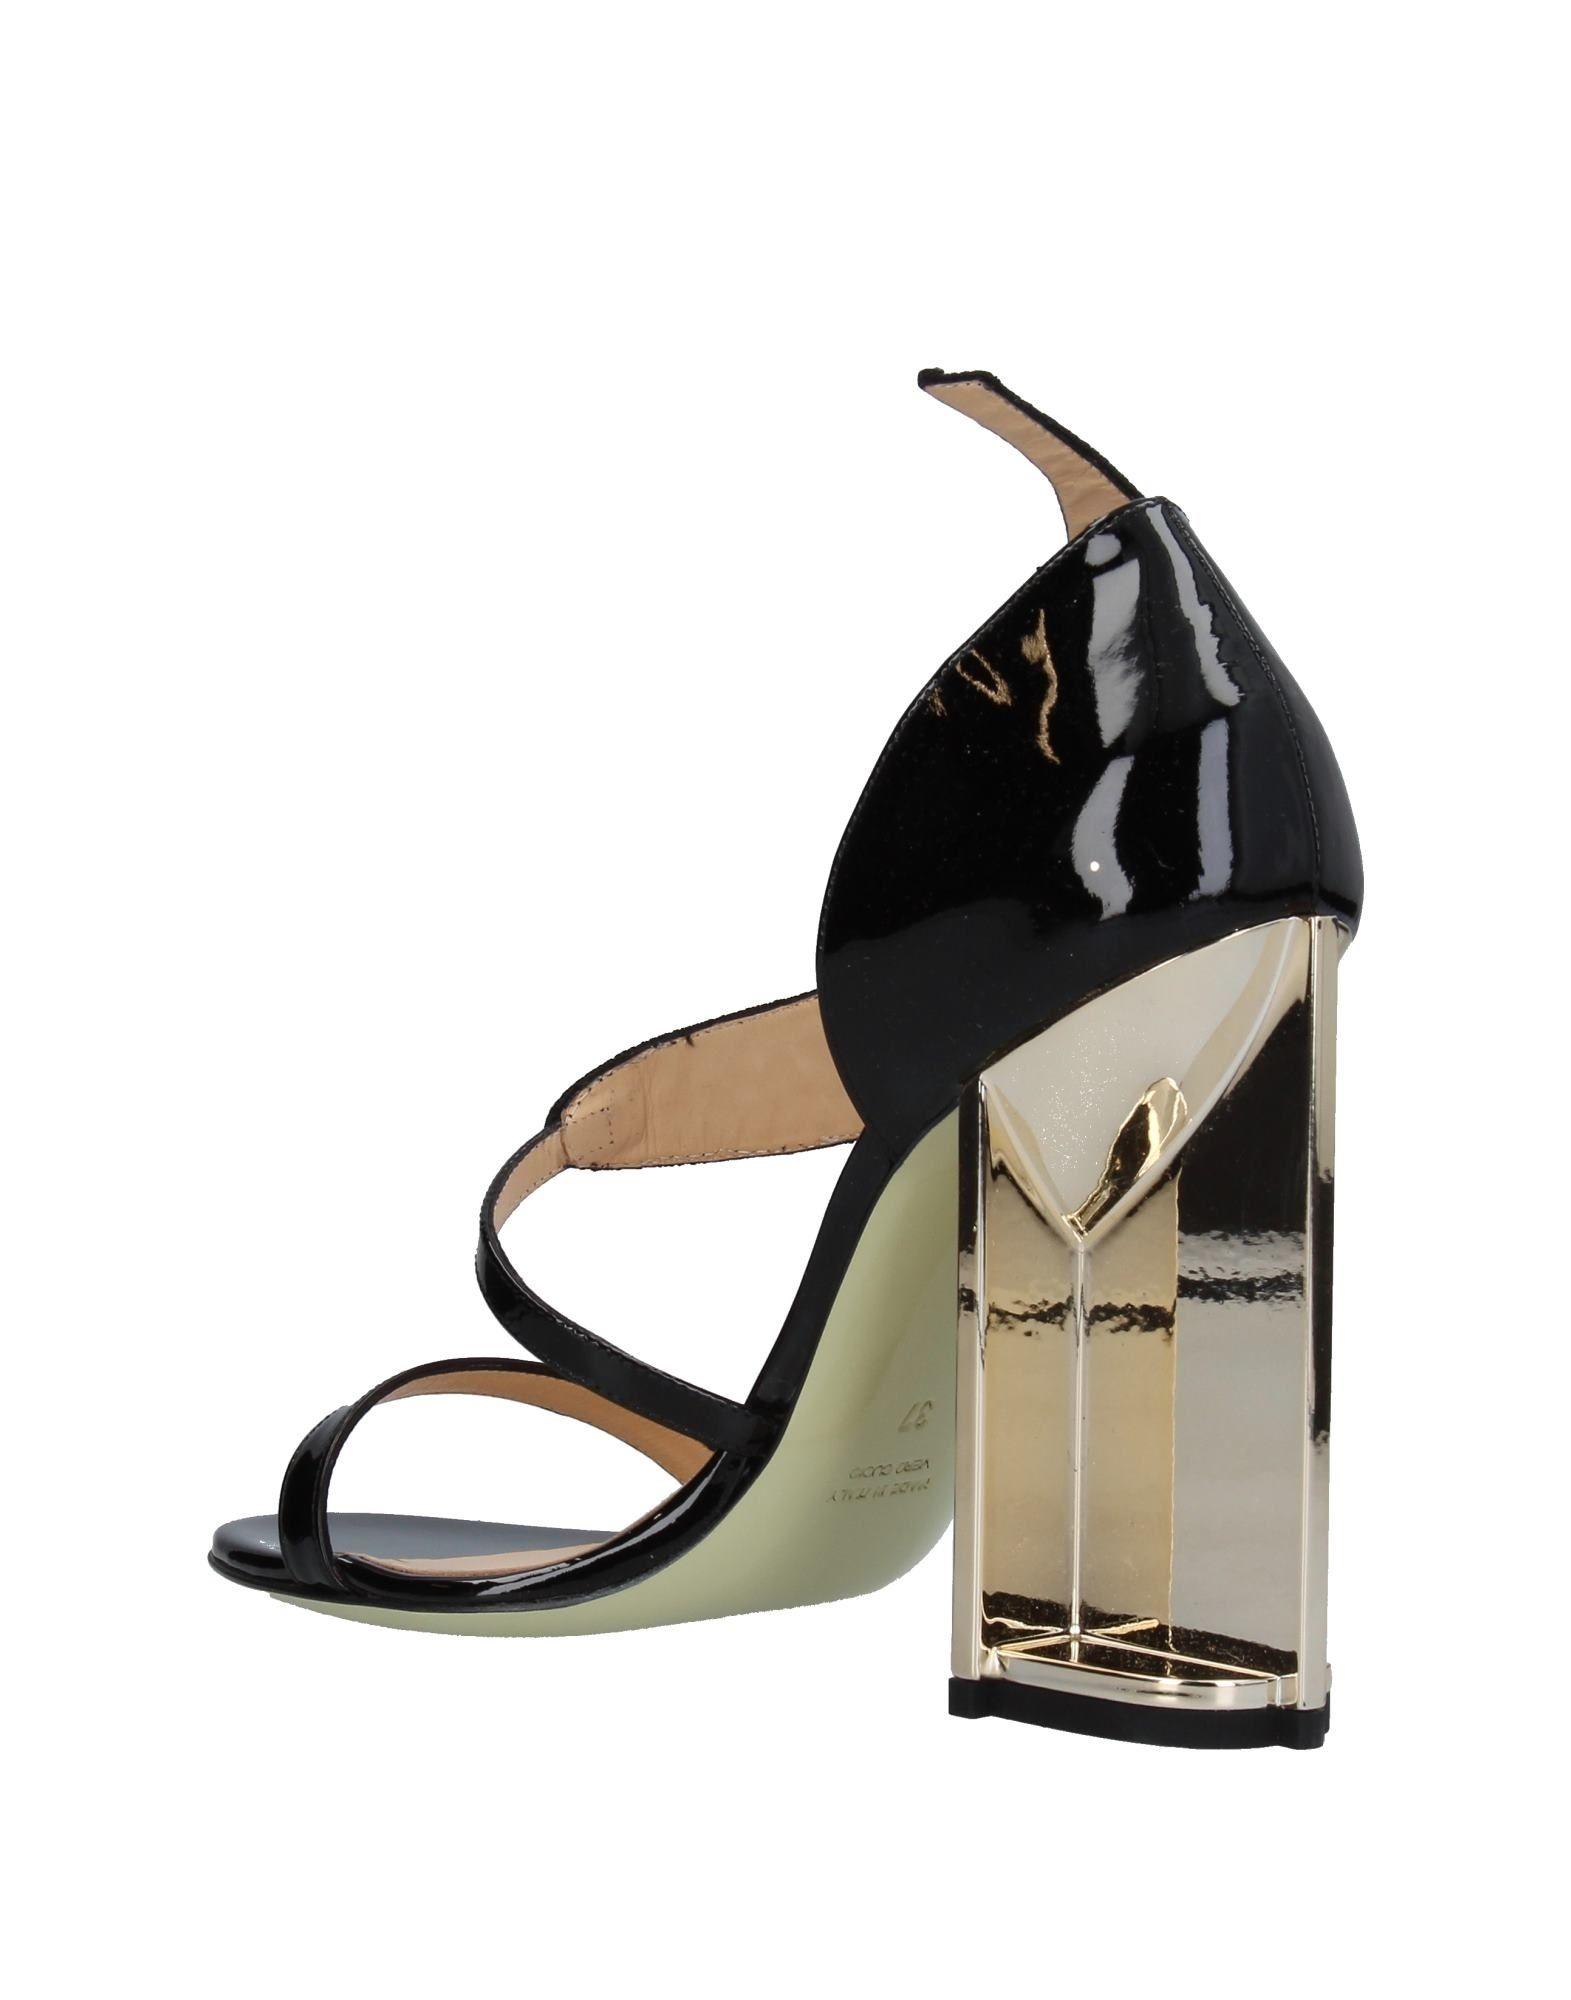 Stilvolle billige Schuhe Damen Giannico Sandalen Damen Schuhe  11377524KR e94b13